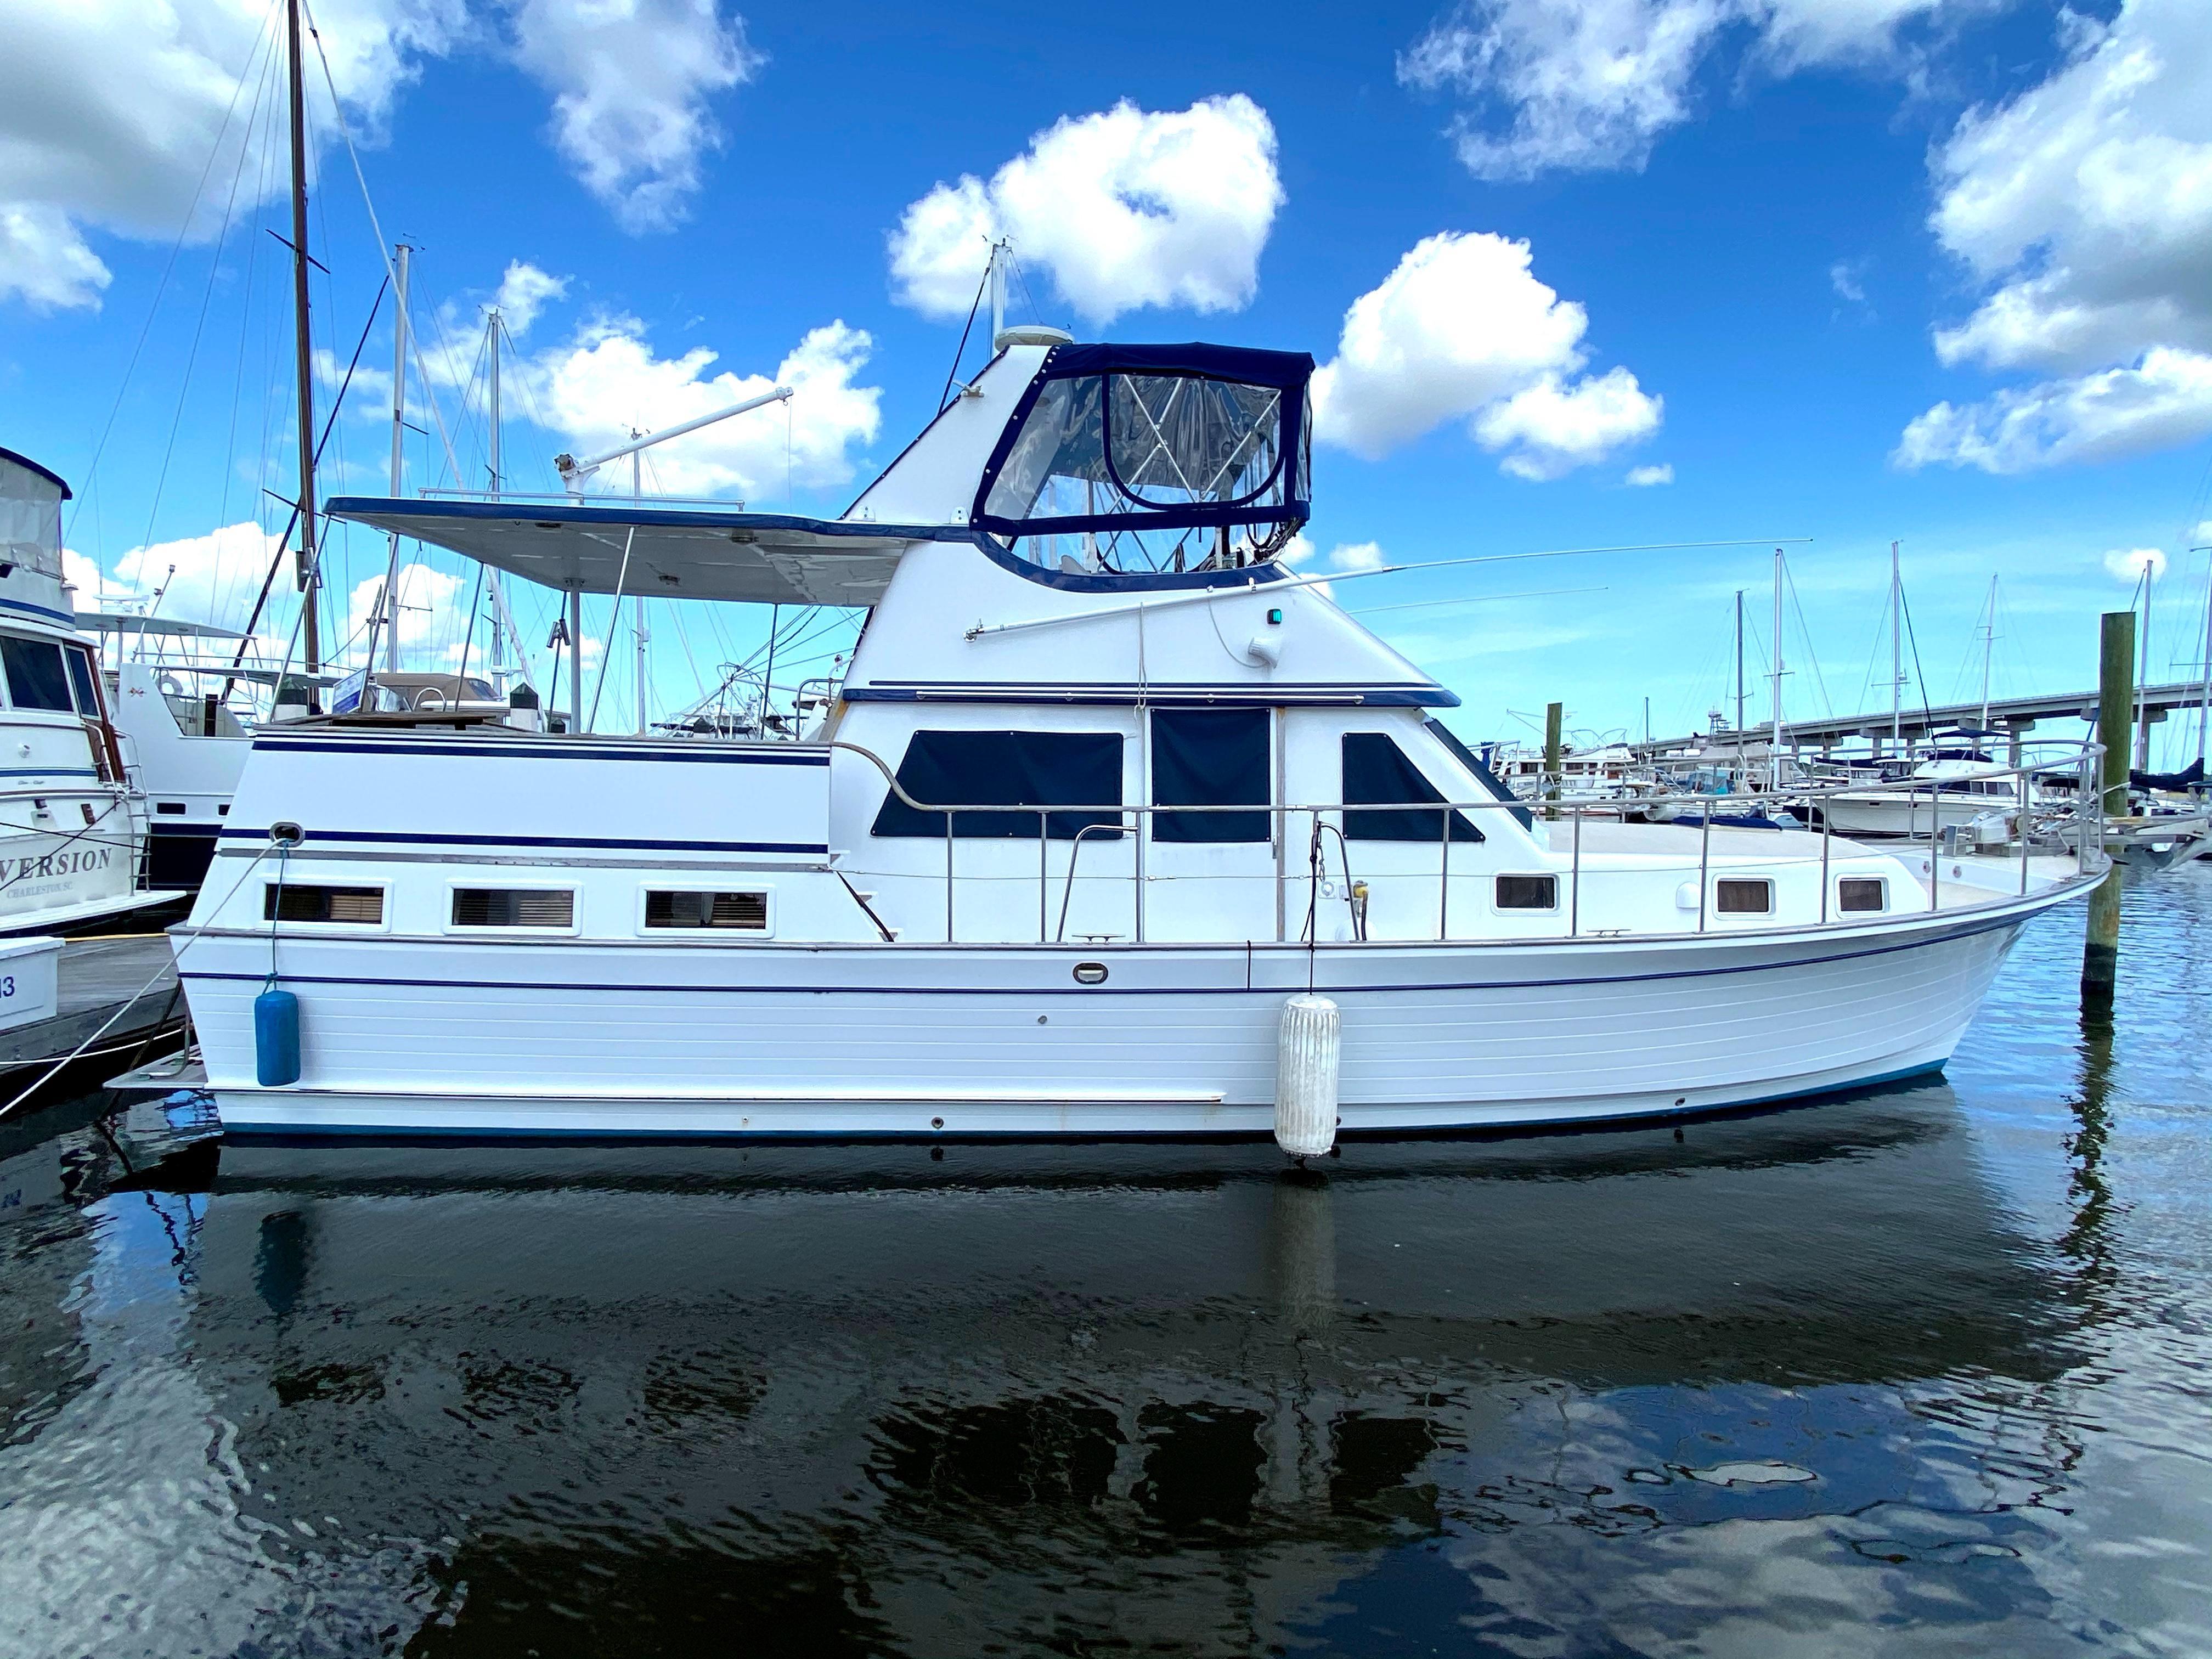 Marine Trader 43 LaBelle Trawler - 1983 marine trader 43 labelle